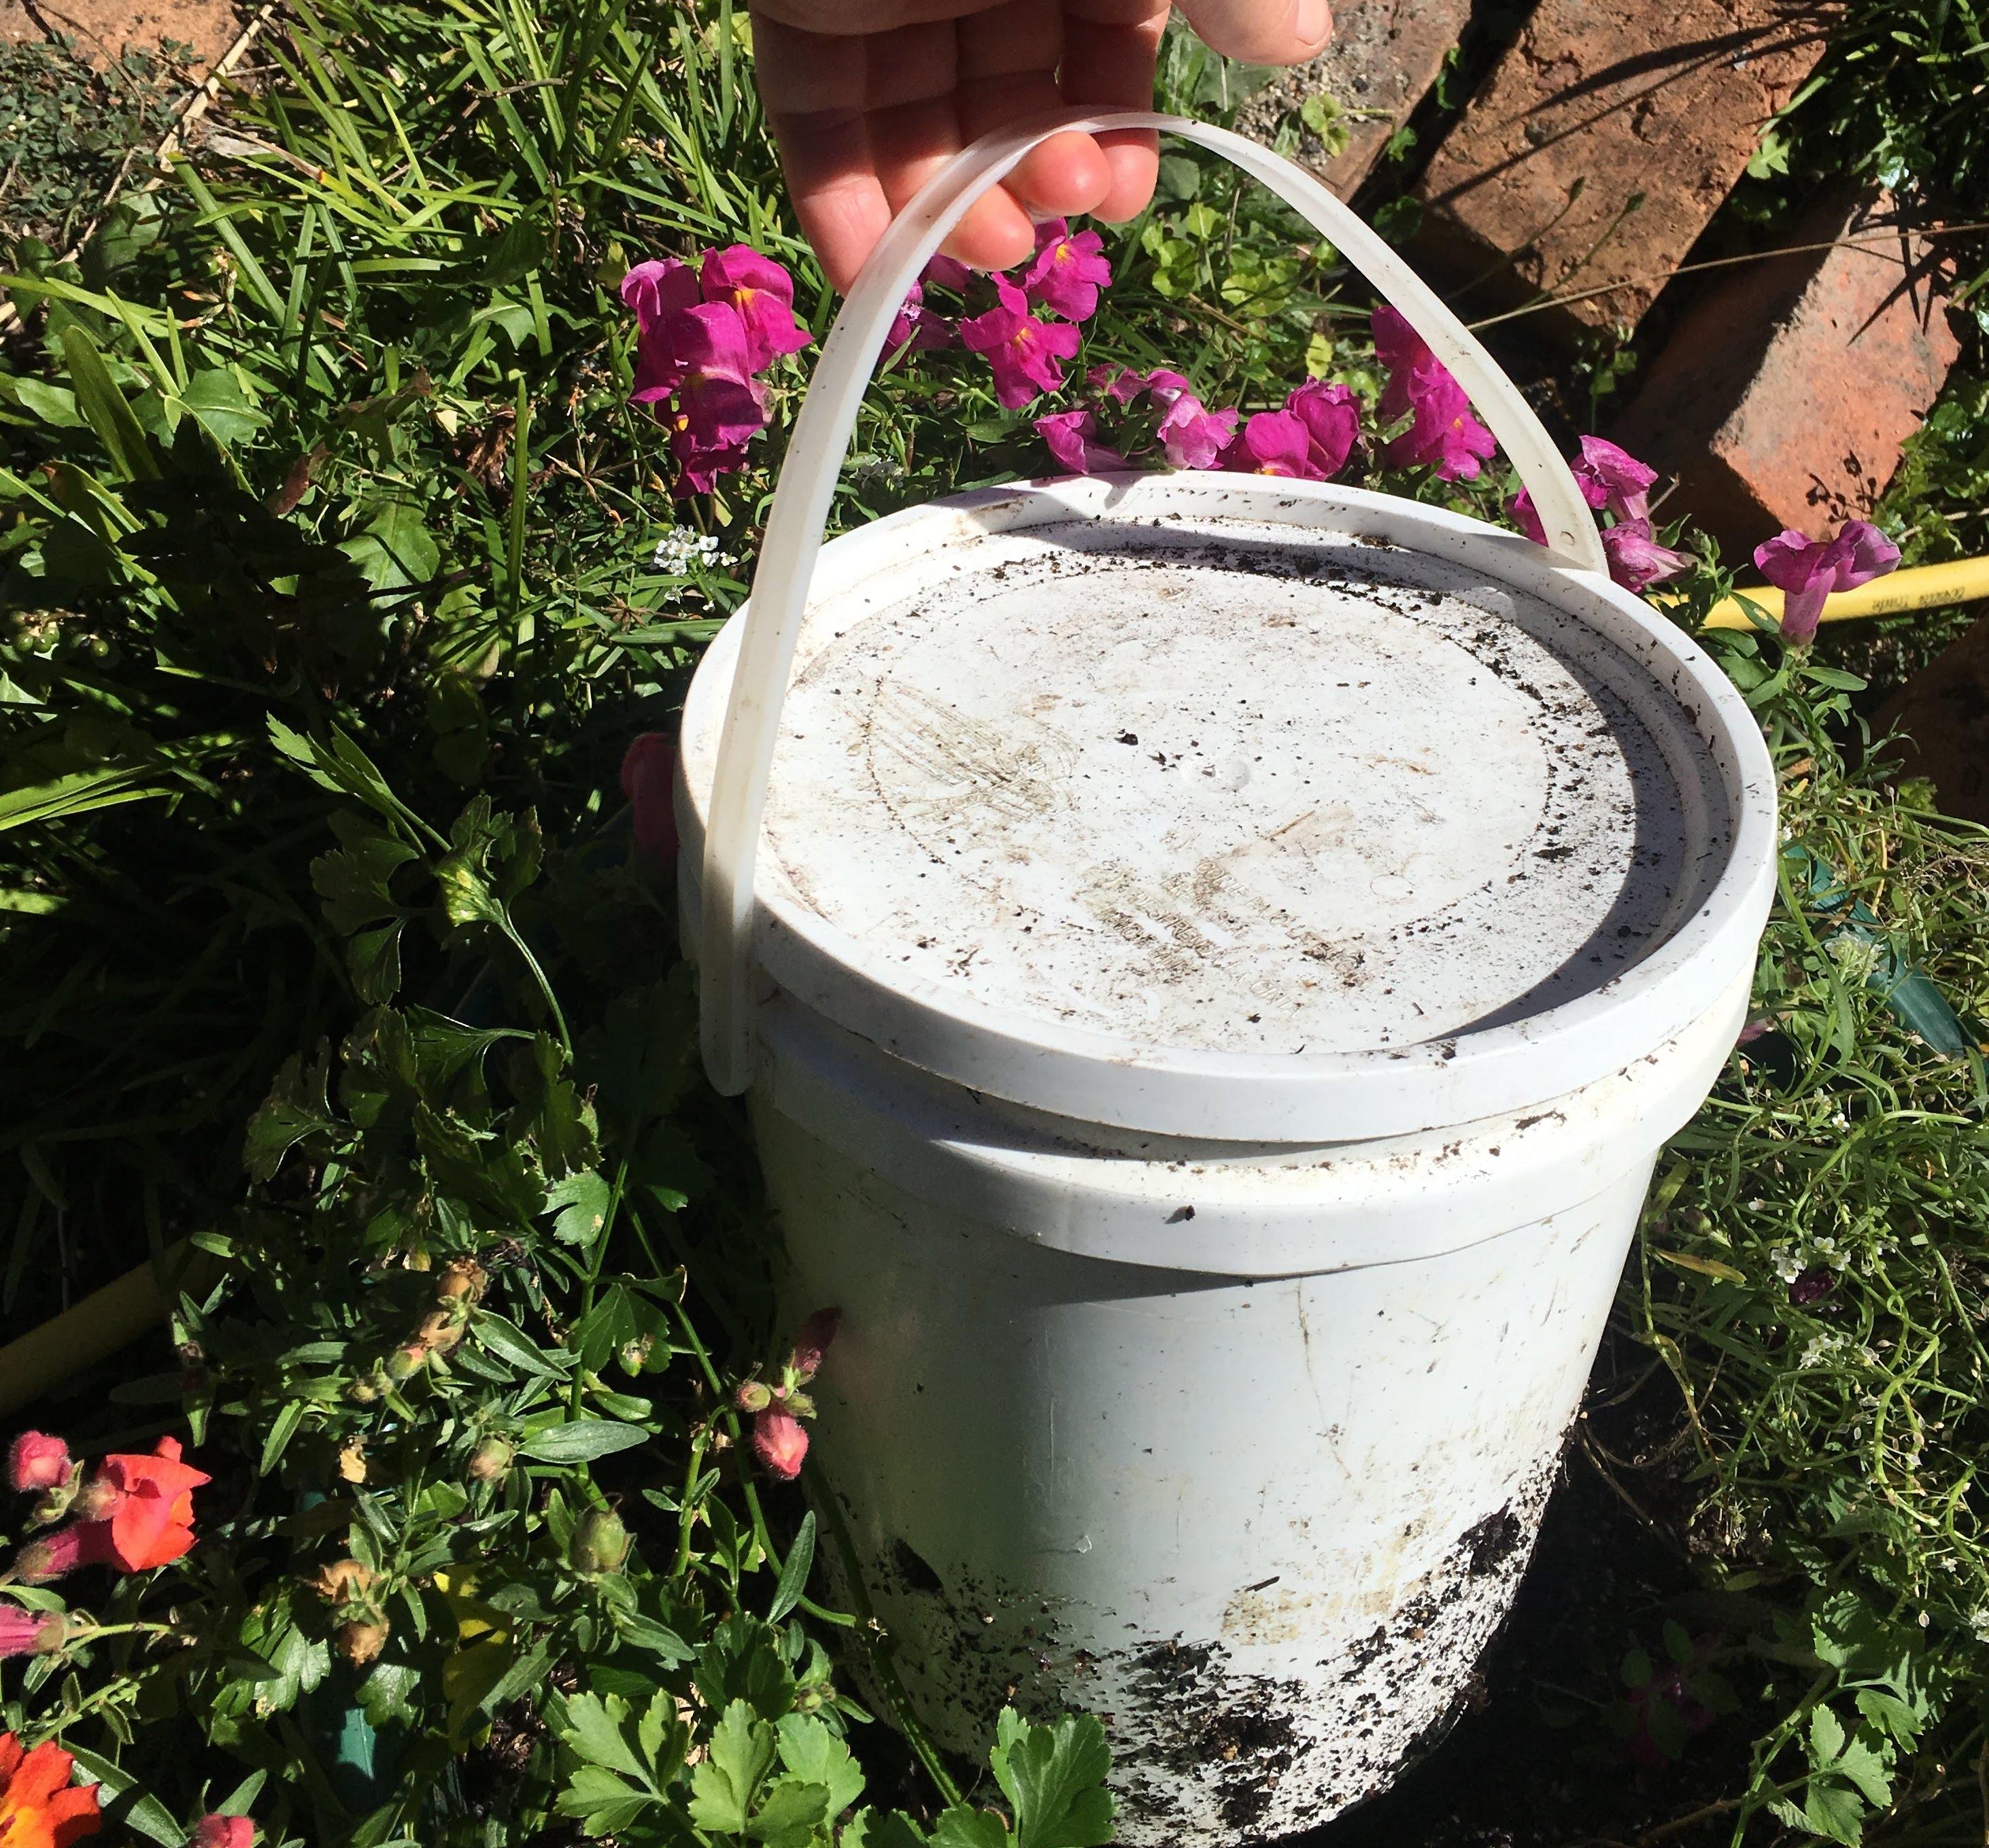 Bucket used as a worm farm